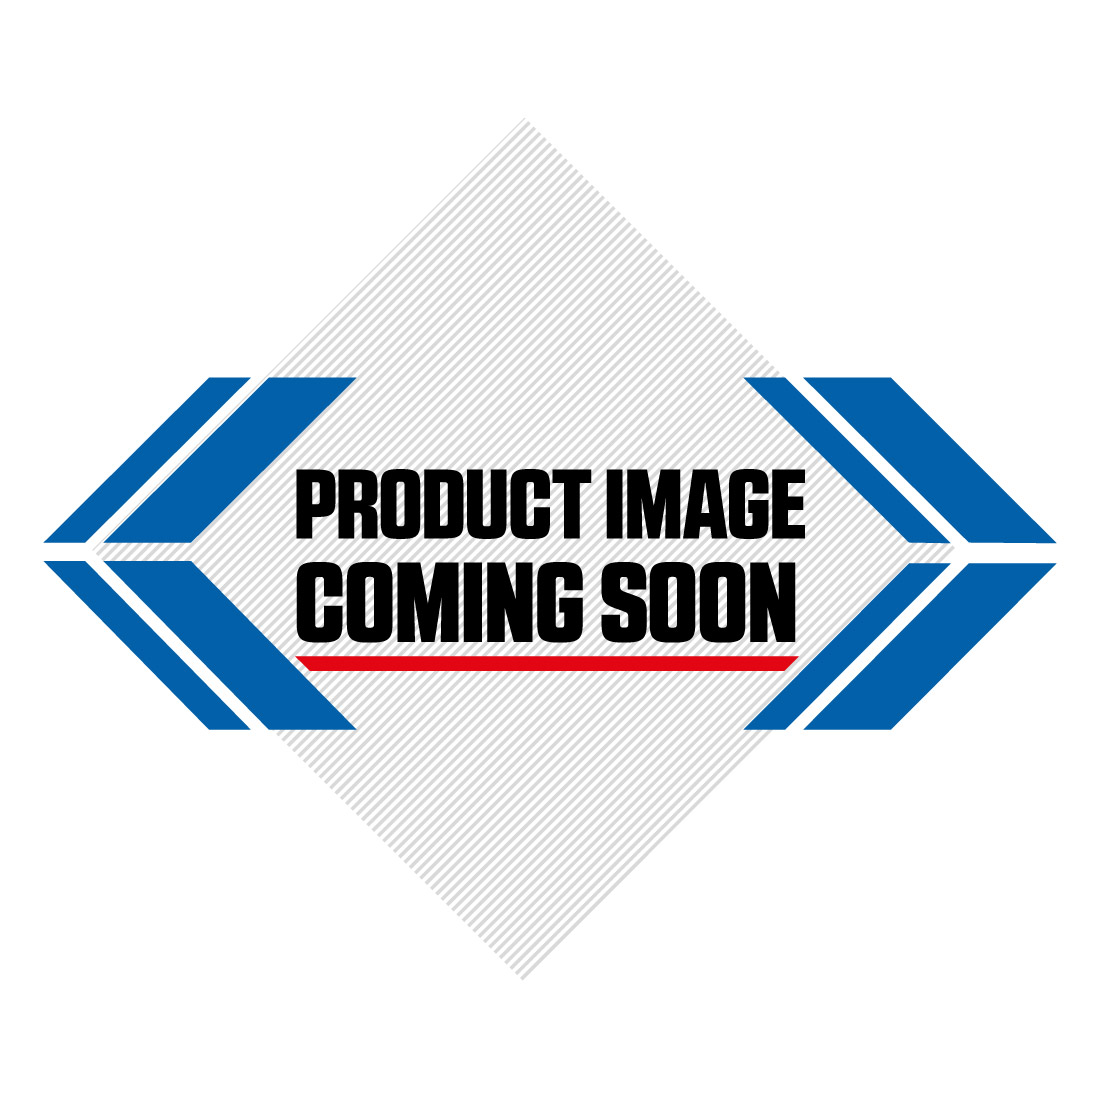 DJI Mavic 2 Pro Drone Image-8